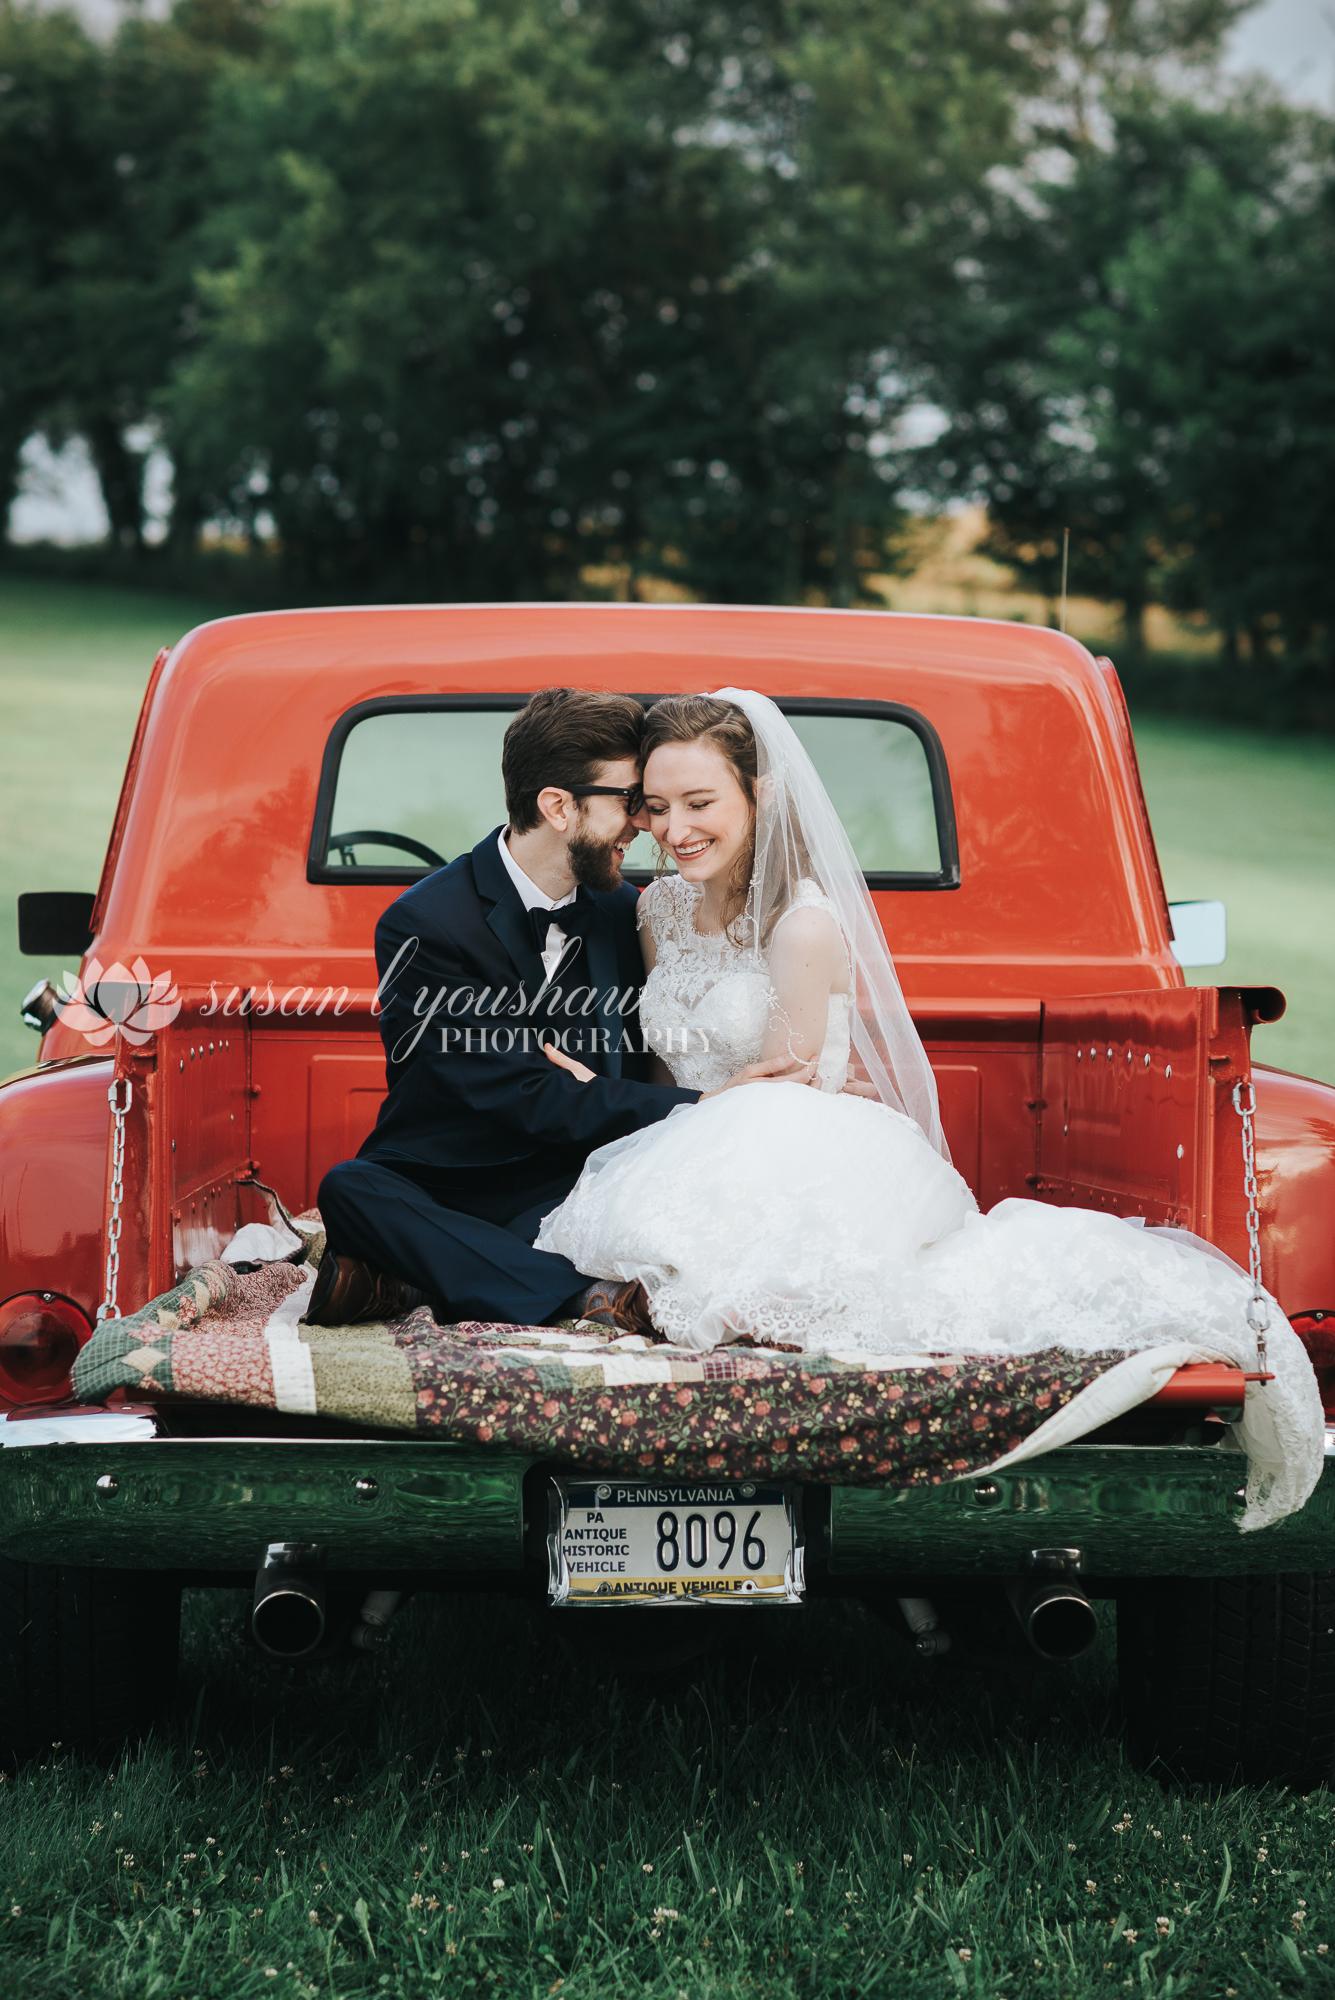 Wedding photograpy Clearridge Event Center-6.jpg